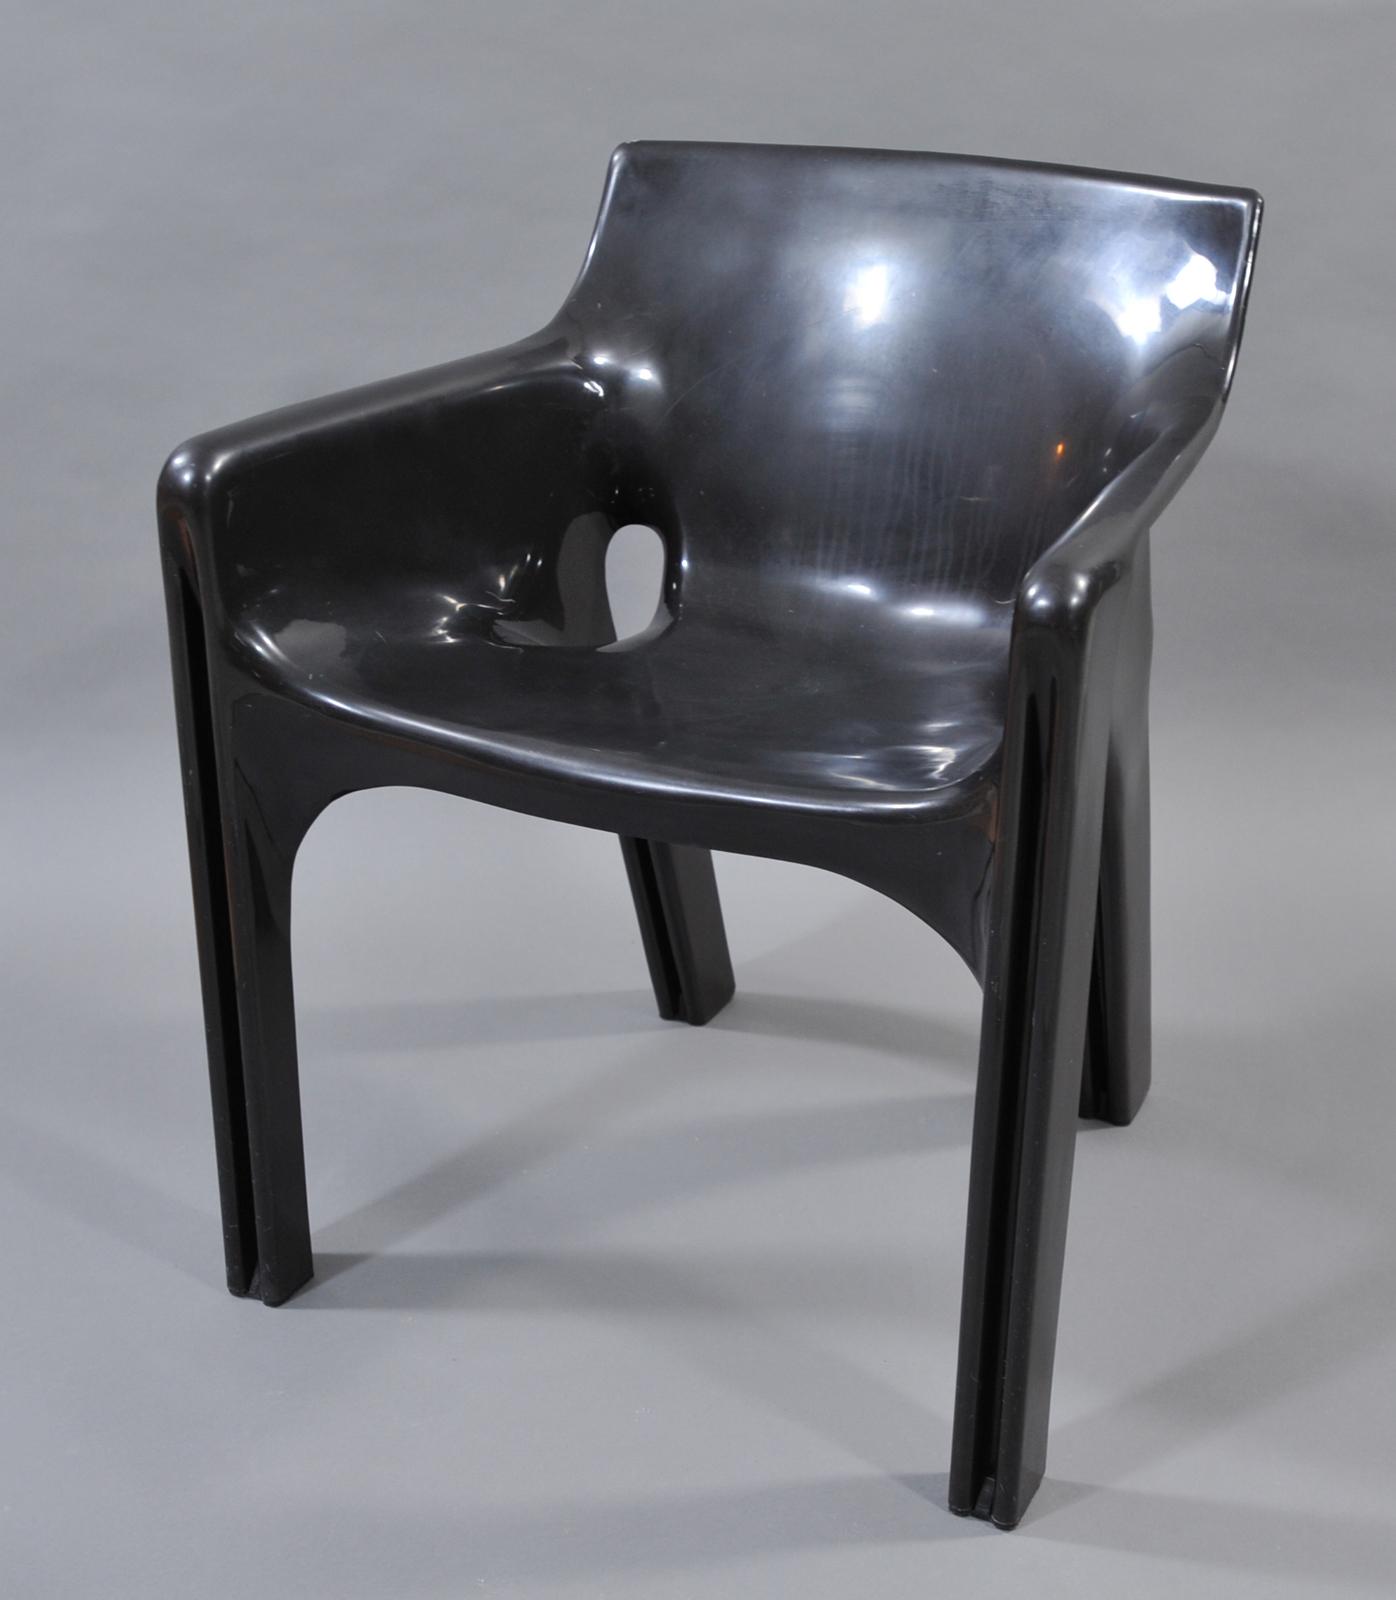 Safi sofa Ligne Roset by Michel Ducaroy - Modulolab